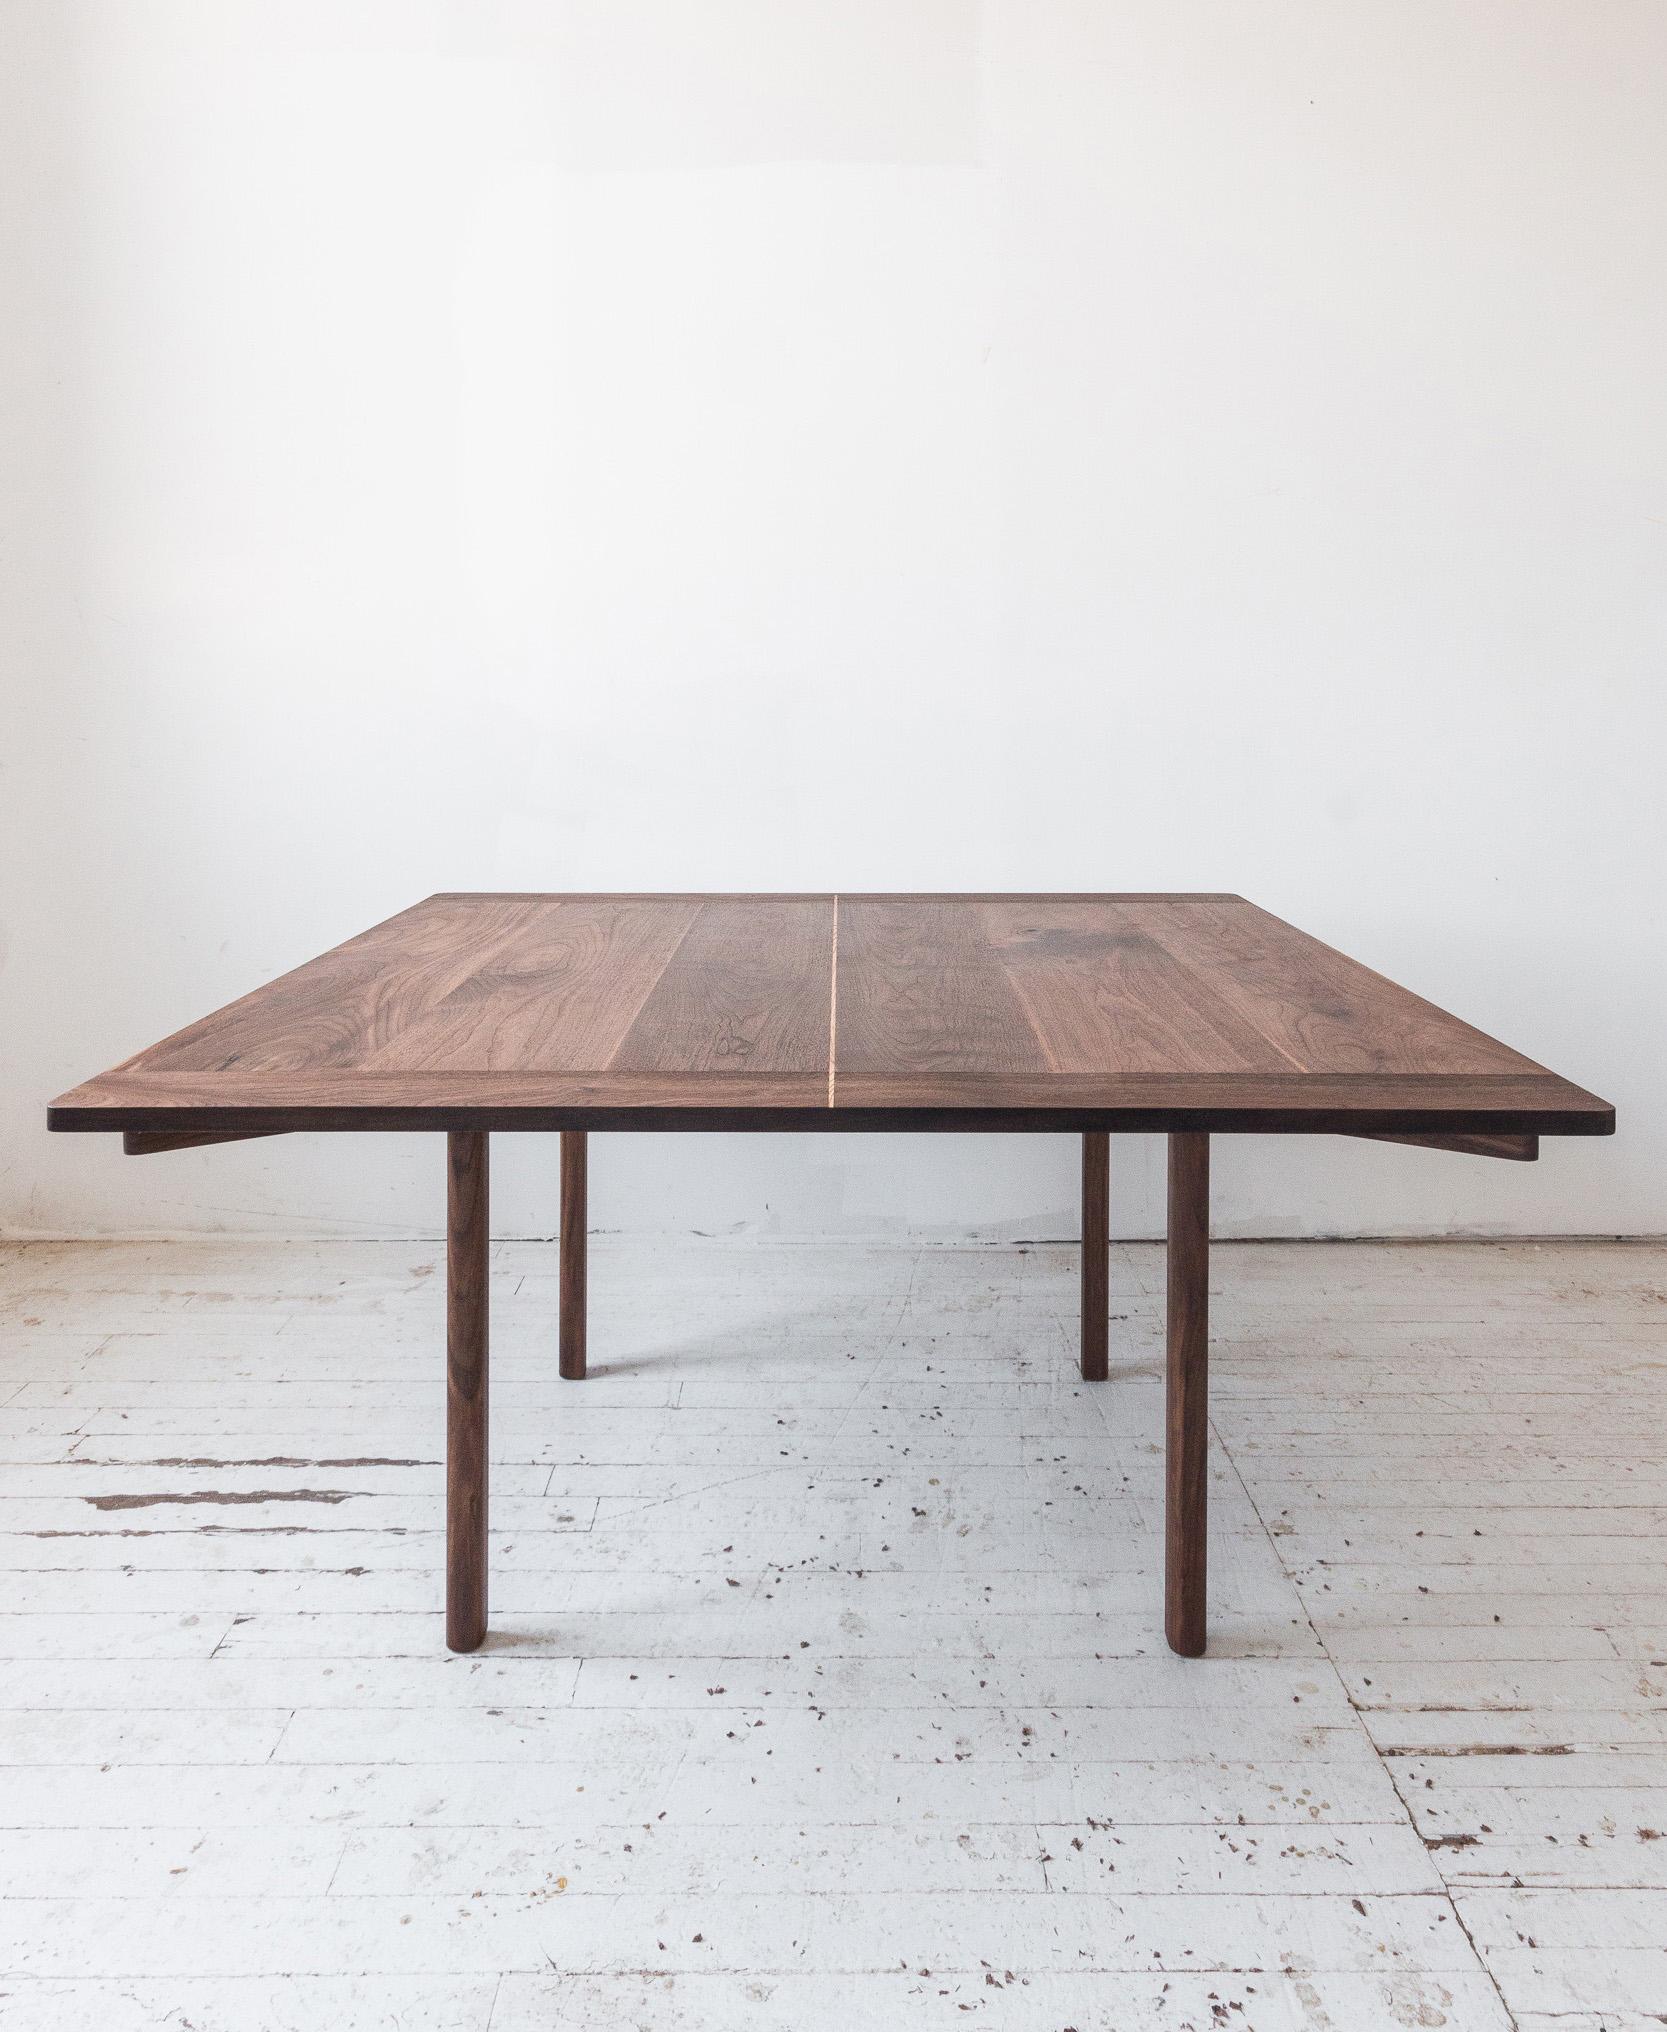 shri communal table